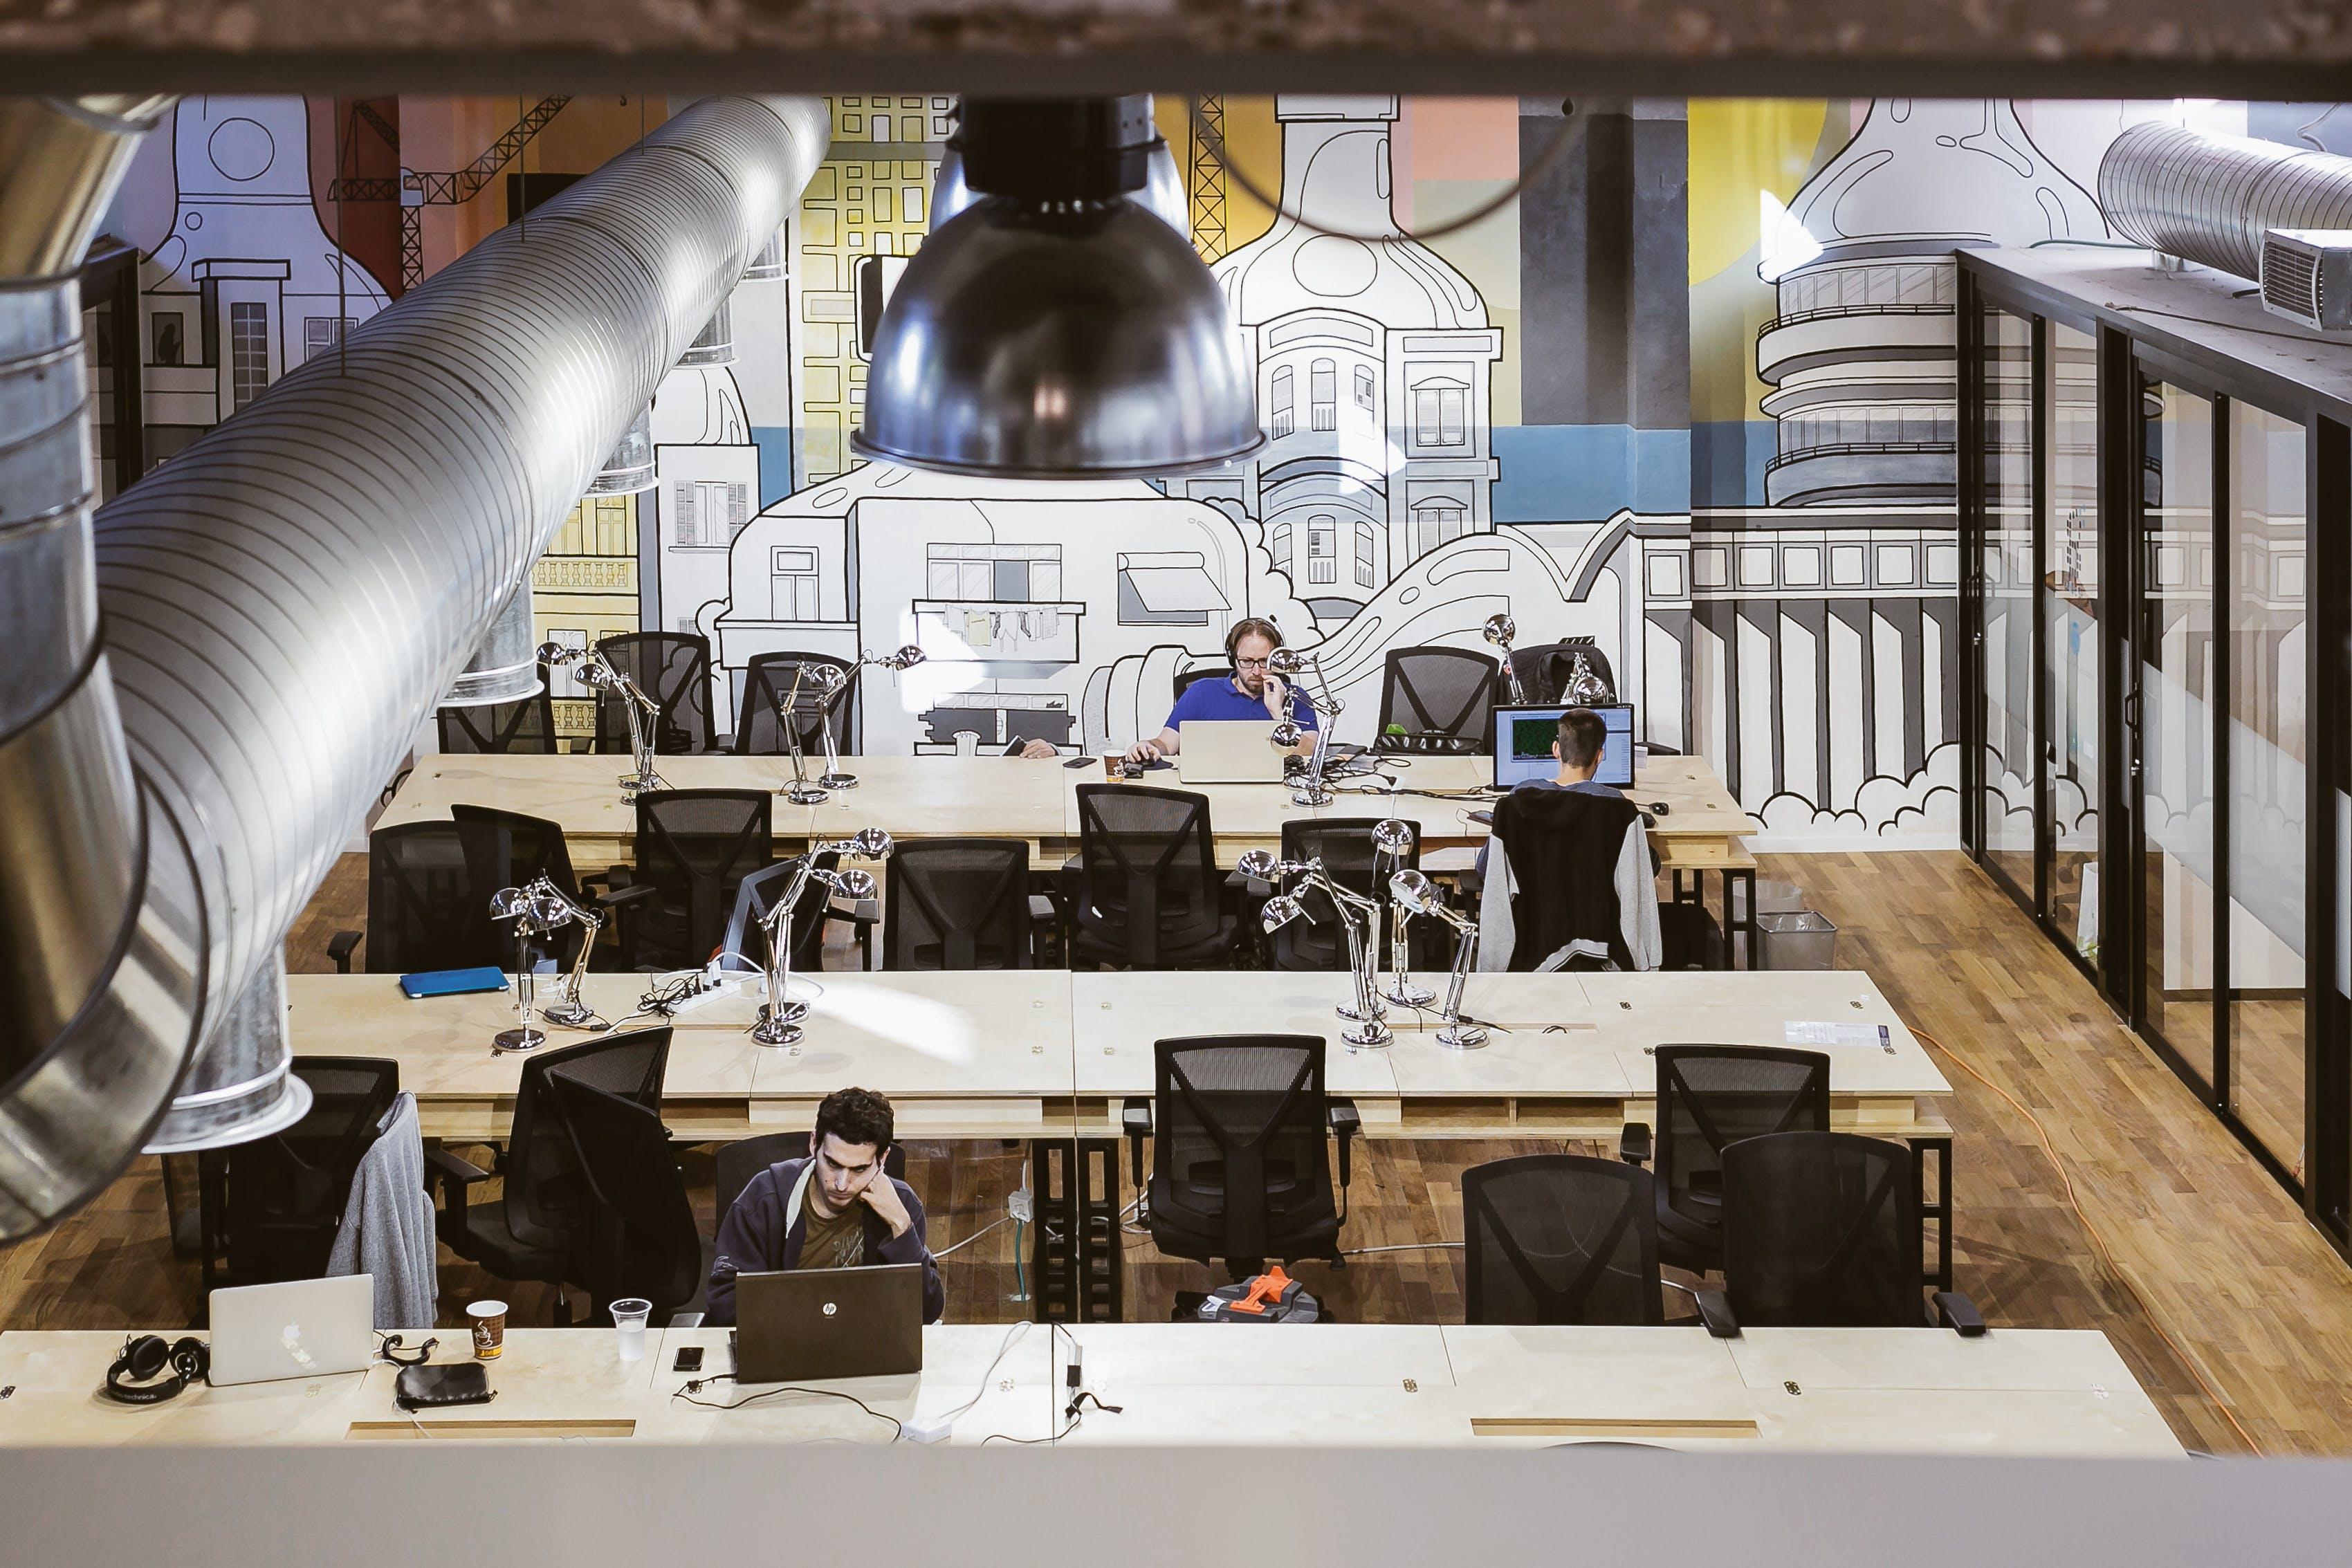 google tel aviv office 33 dubnov coworking office wework